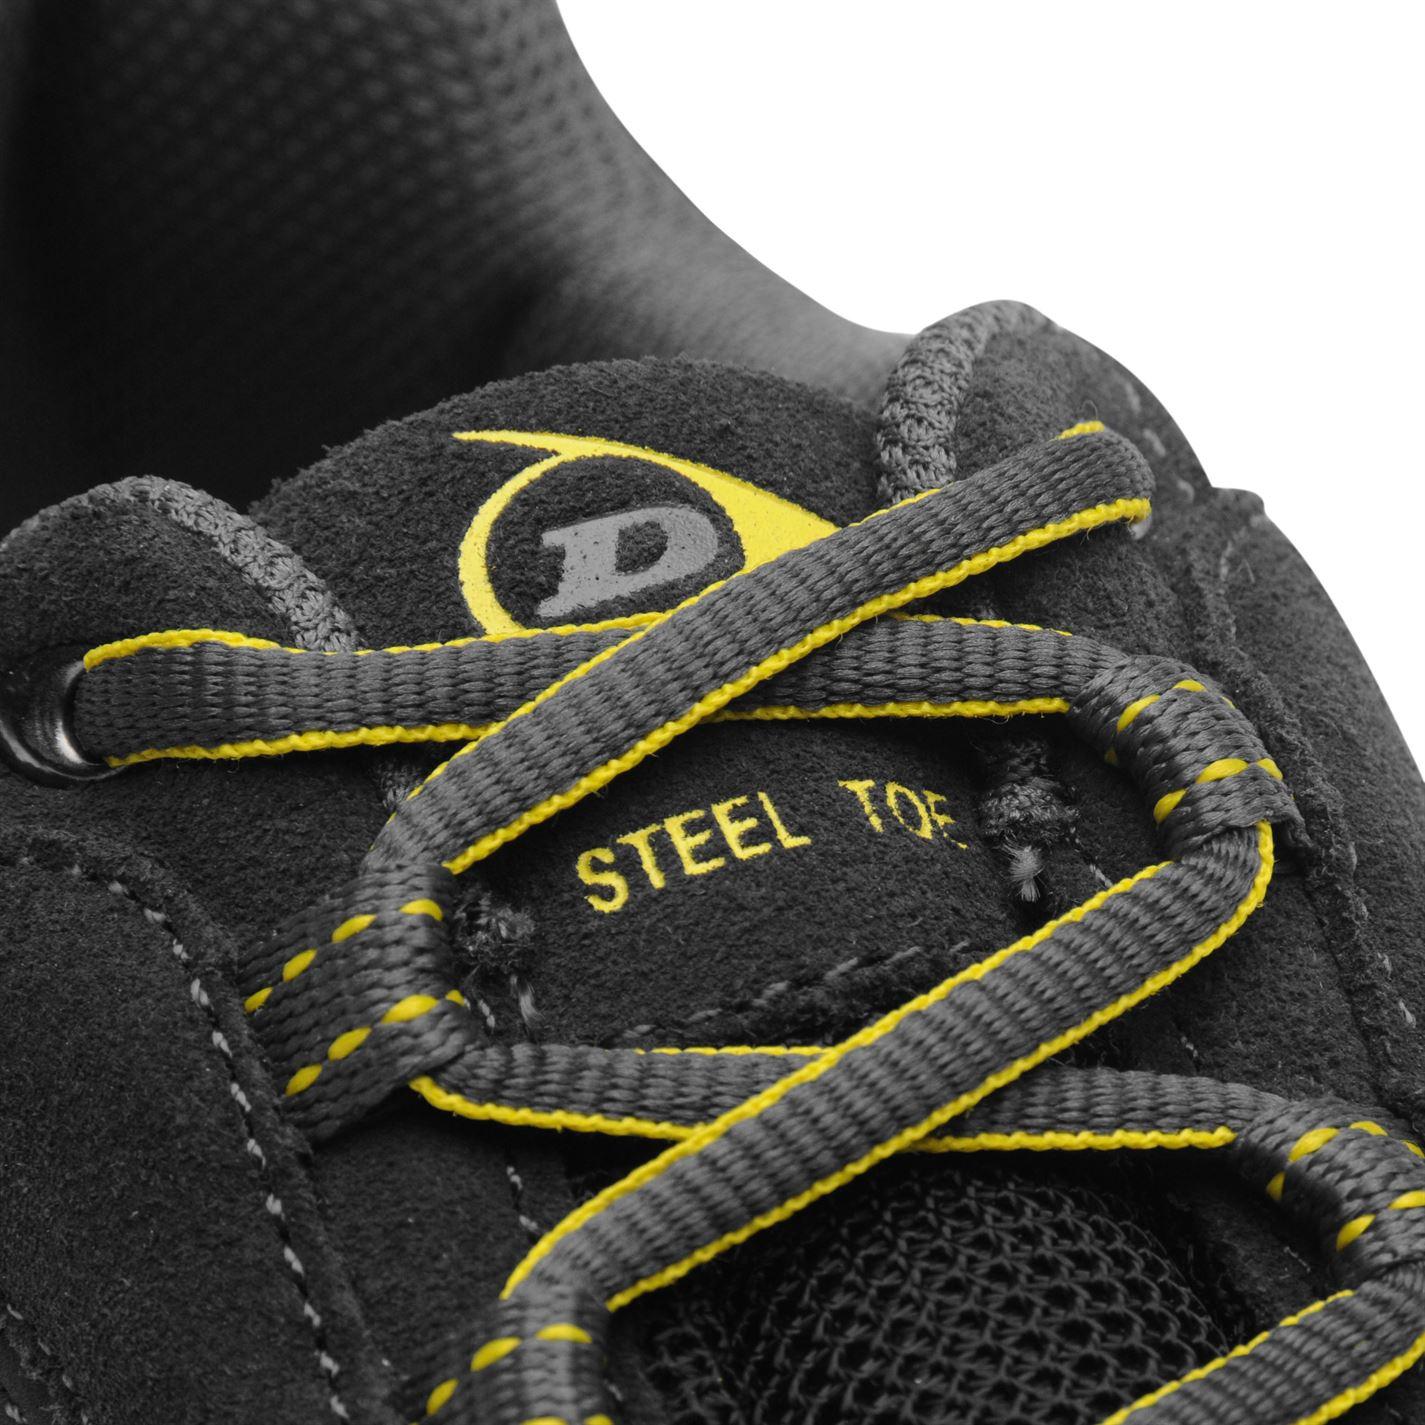 d03951a3784d Dunlop Mens Gents Safety Iowa Shoes Footwear